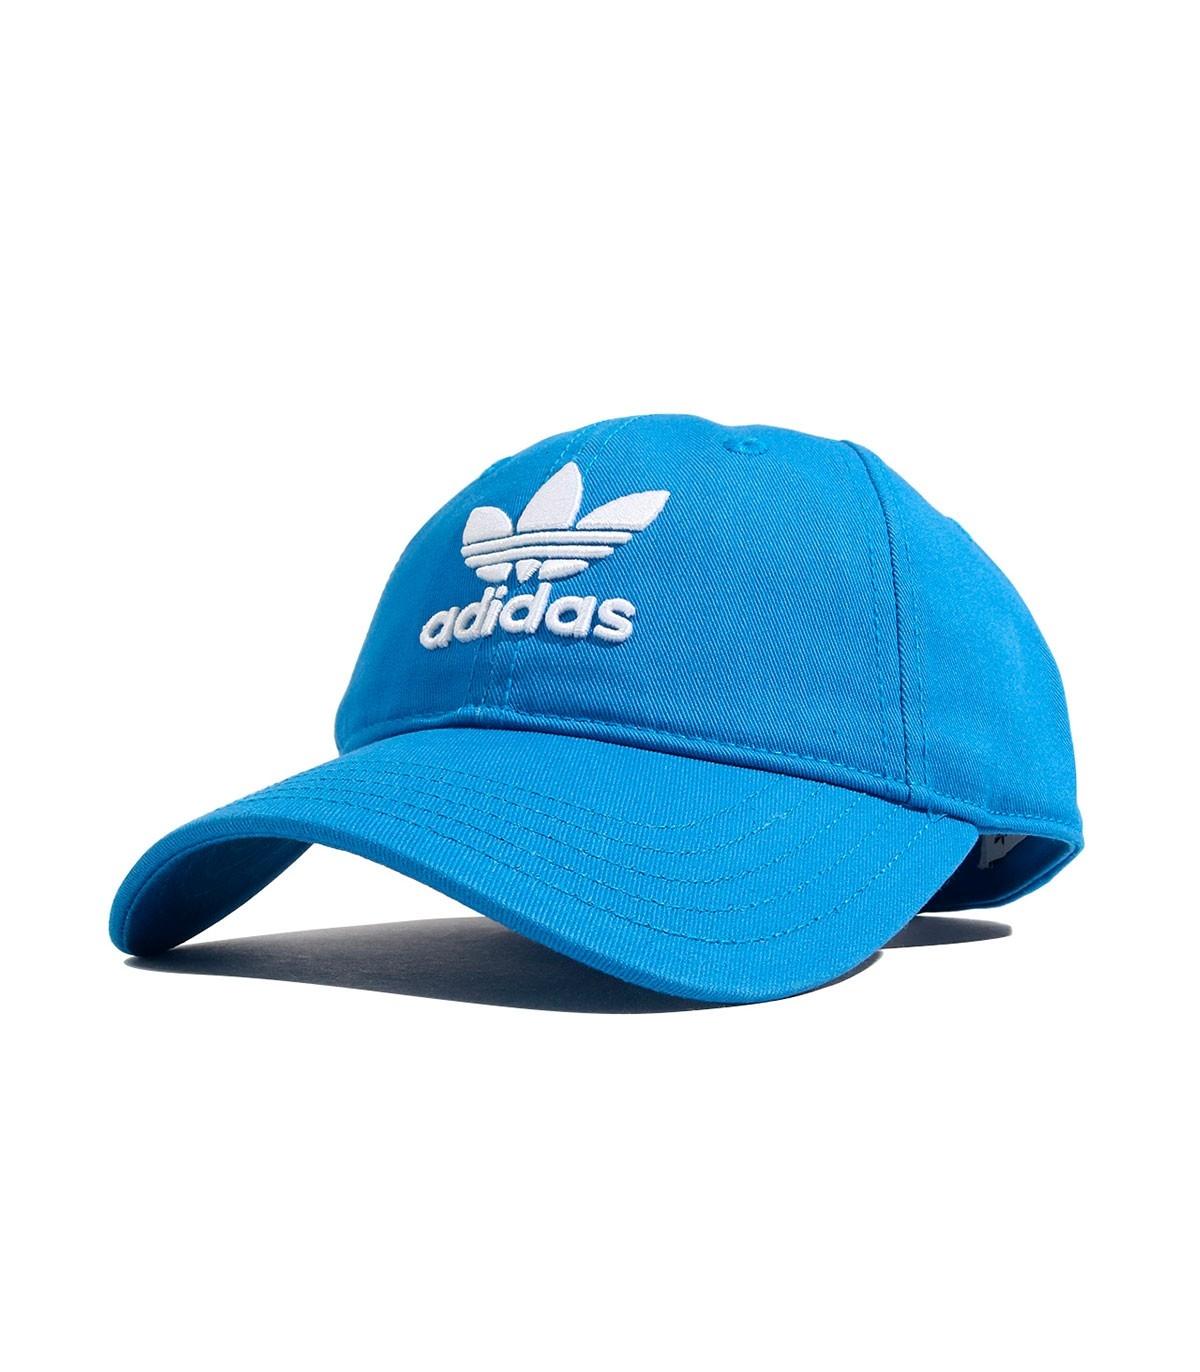 510fa3ba6732a Buy Adidas Trefoil Cap Gorra